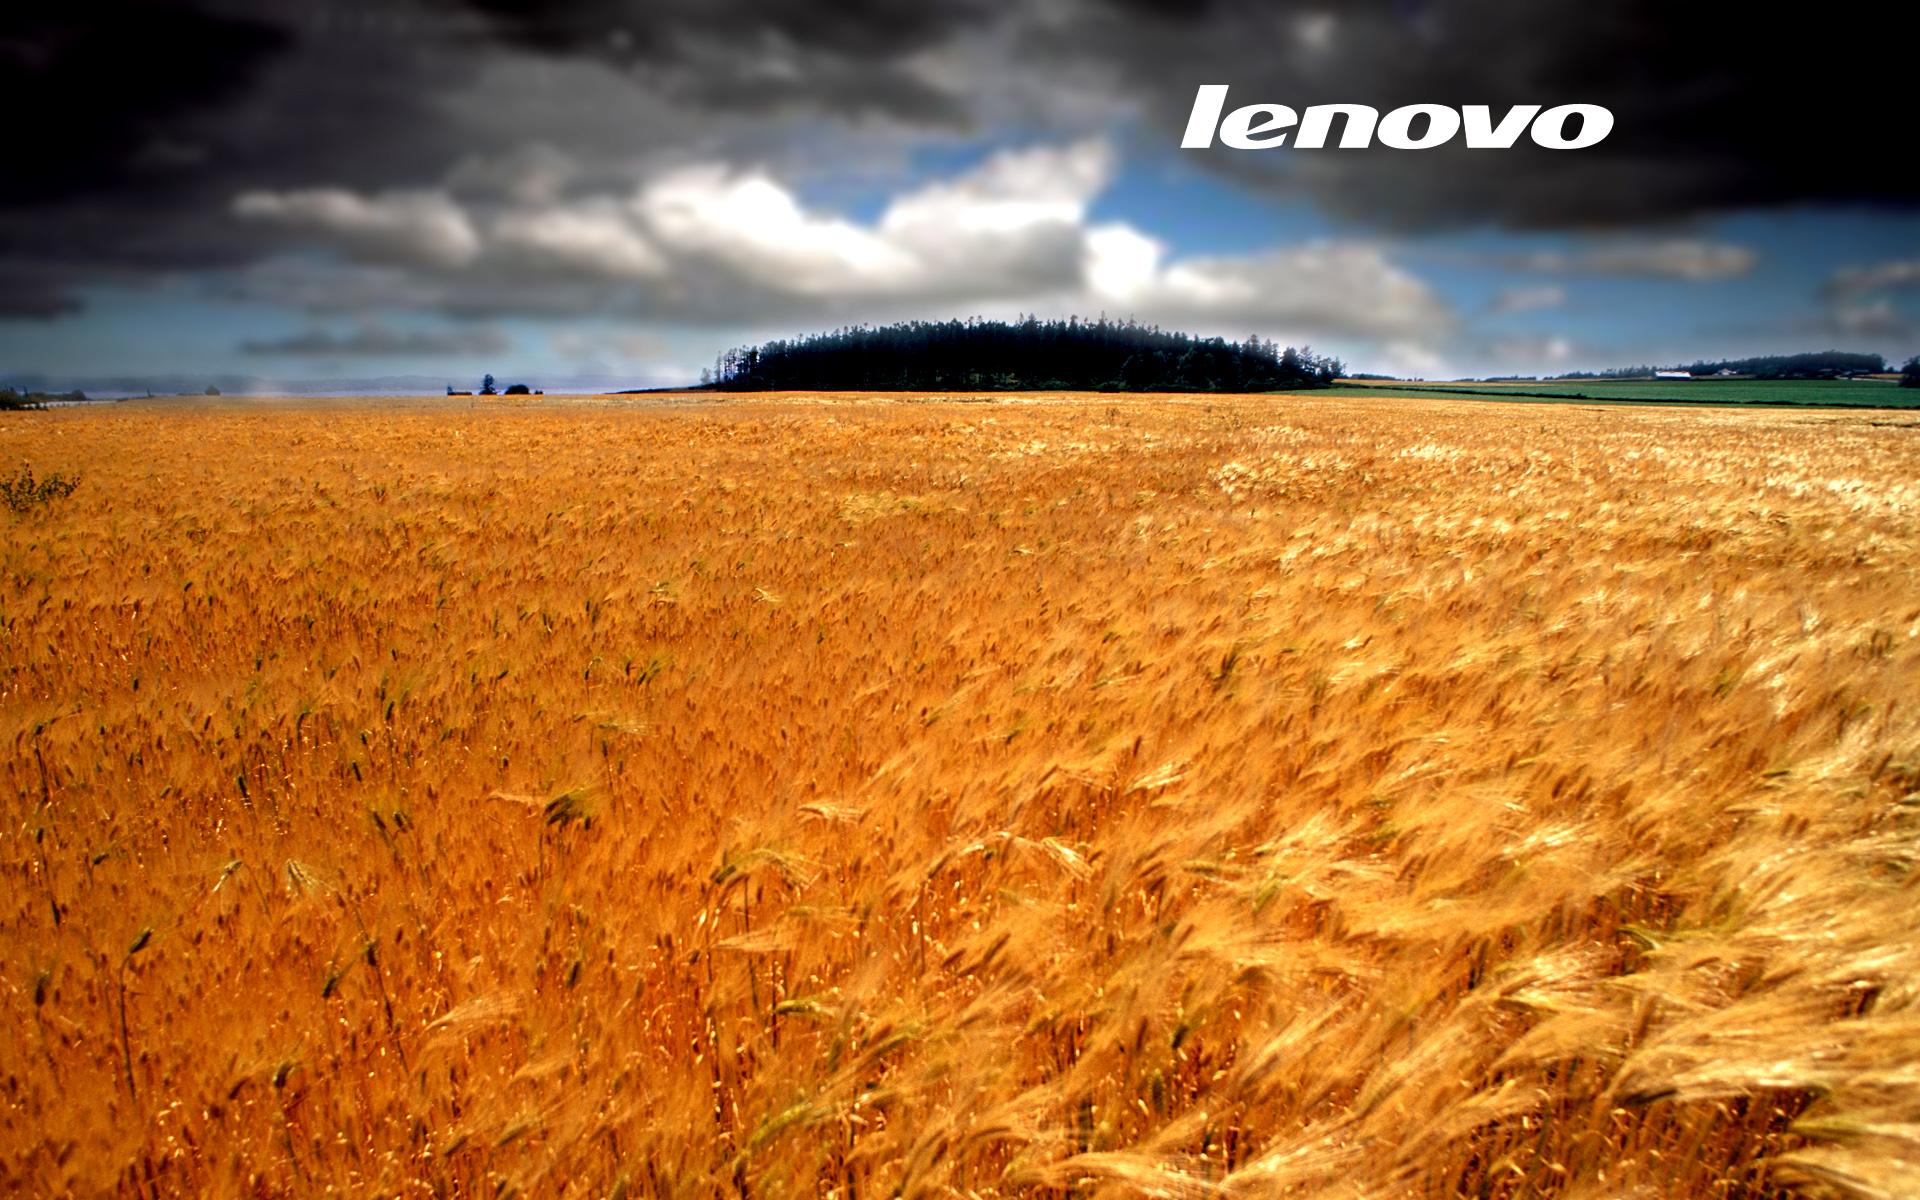 Lenovo wallpaper 19595 1920x1200 px hdwallsource lenovo wallpaper 19595 voltagebd Image collections